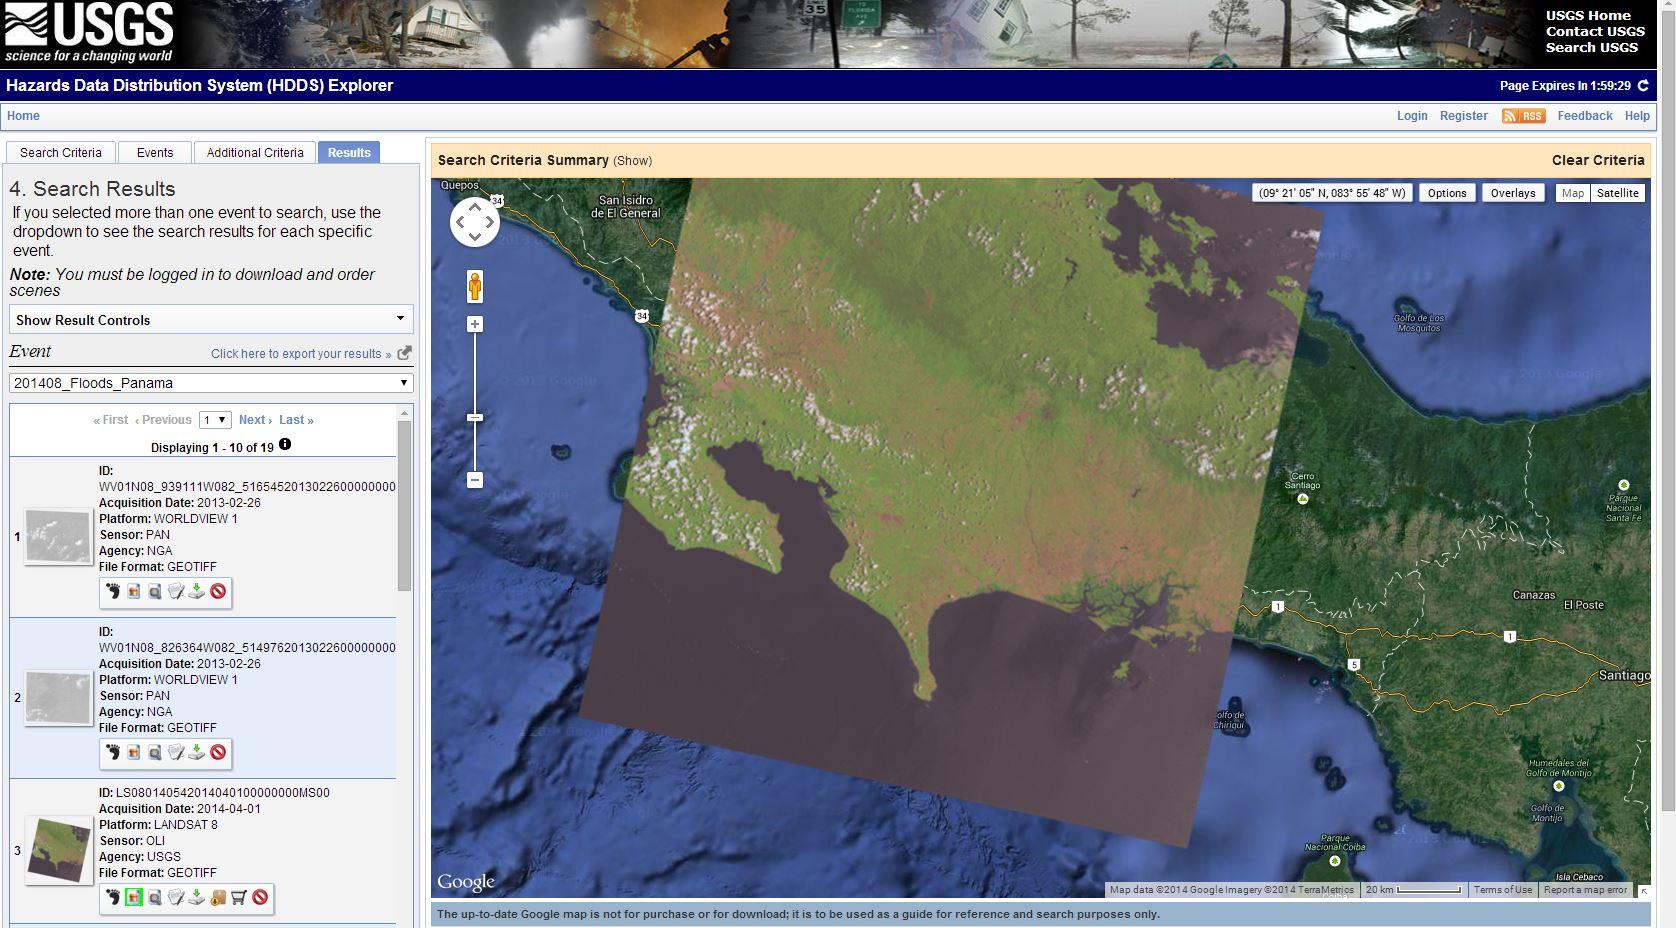 HDDS Explorer (USGS)